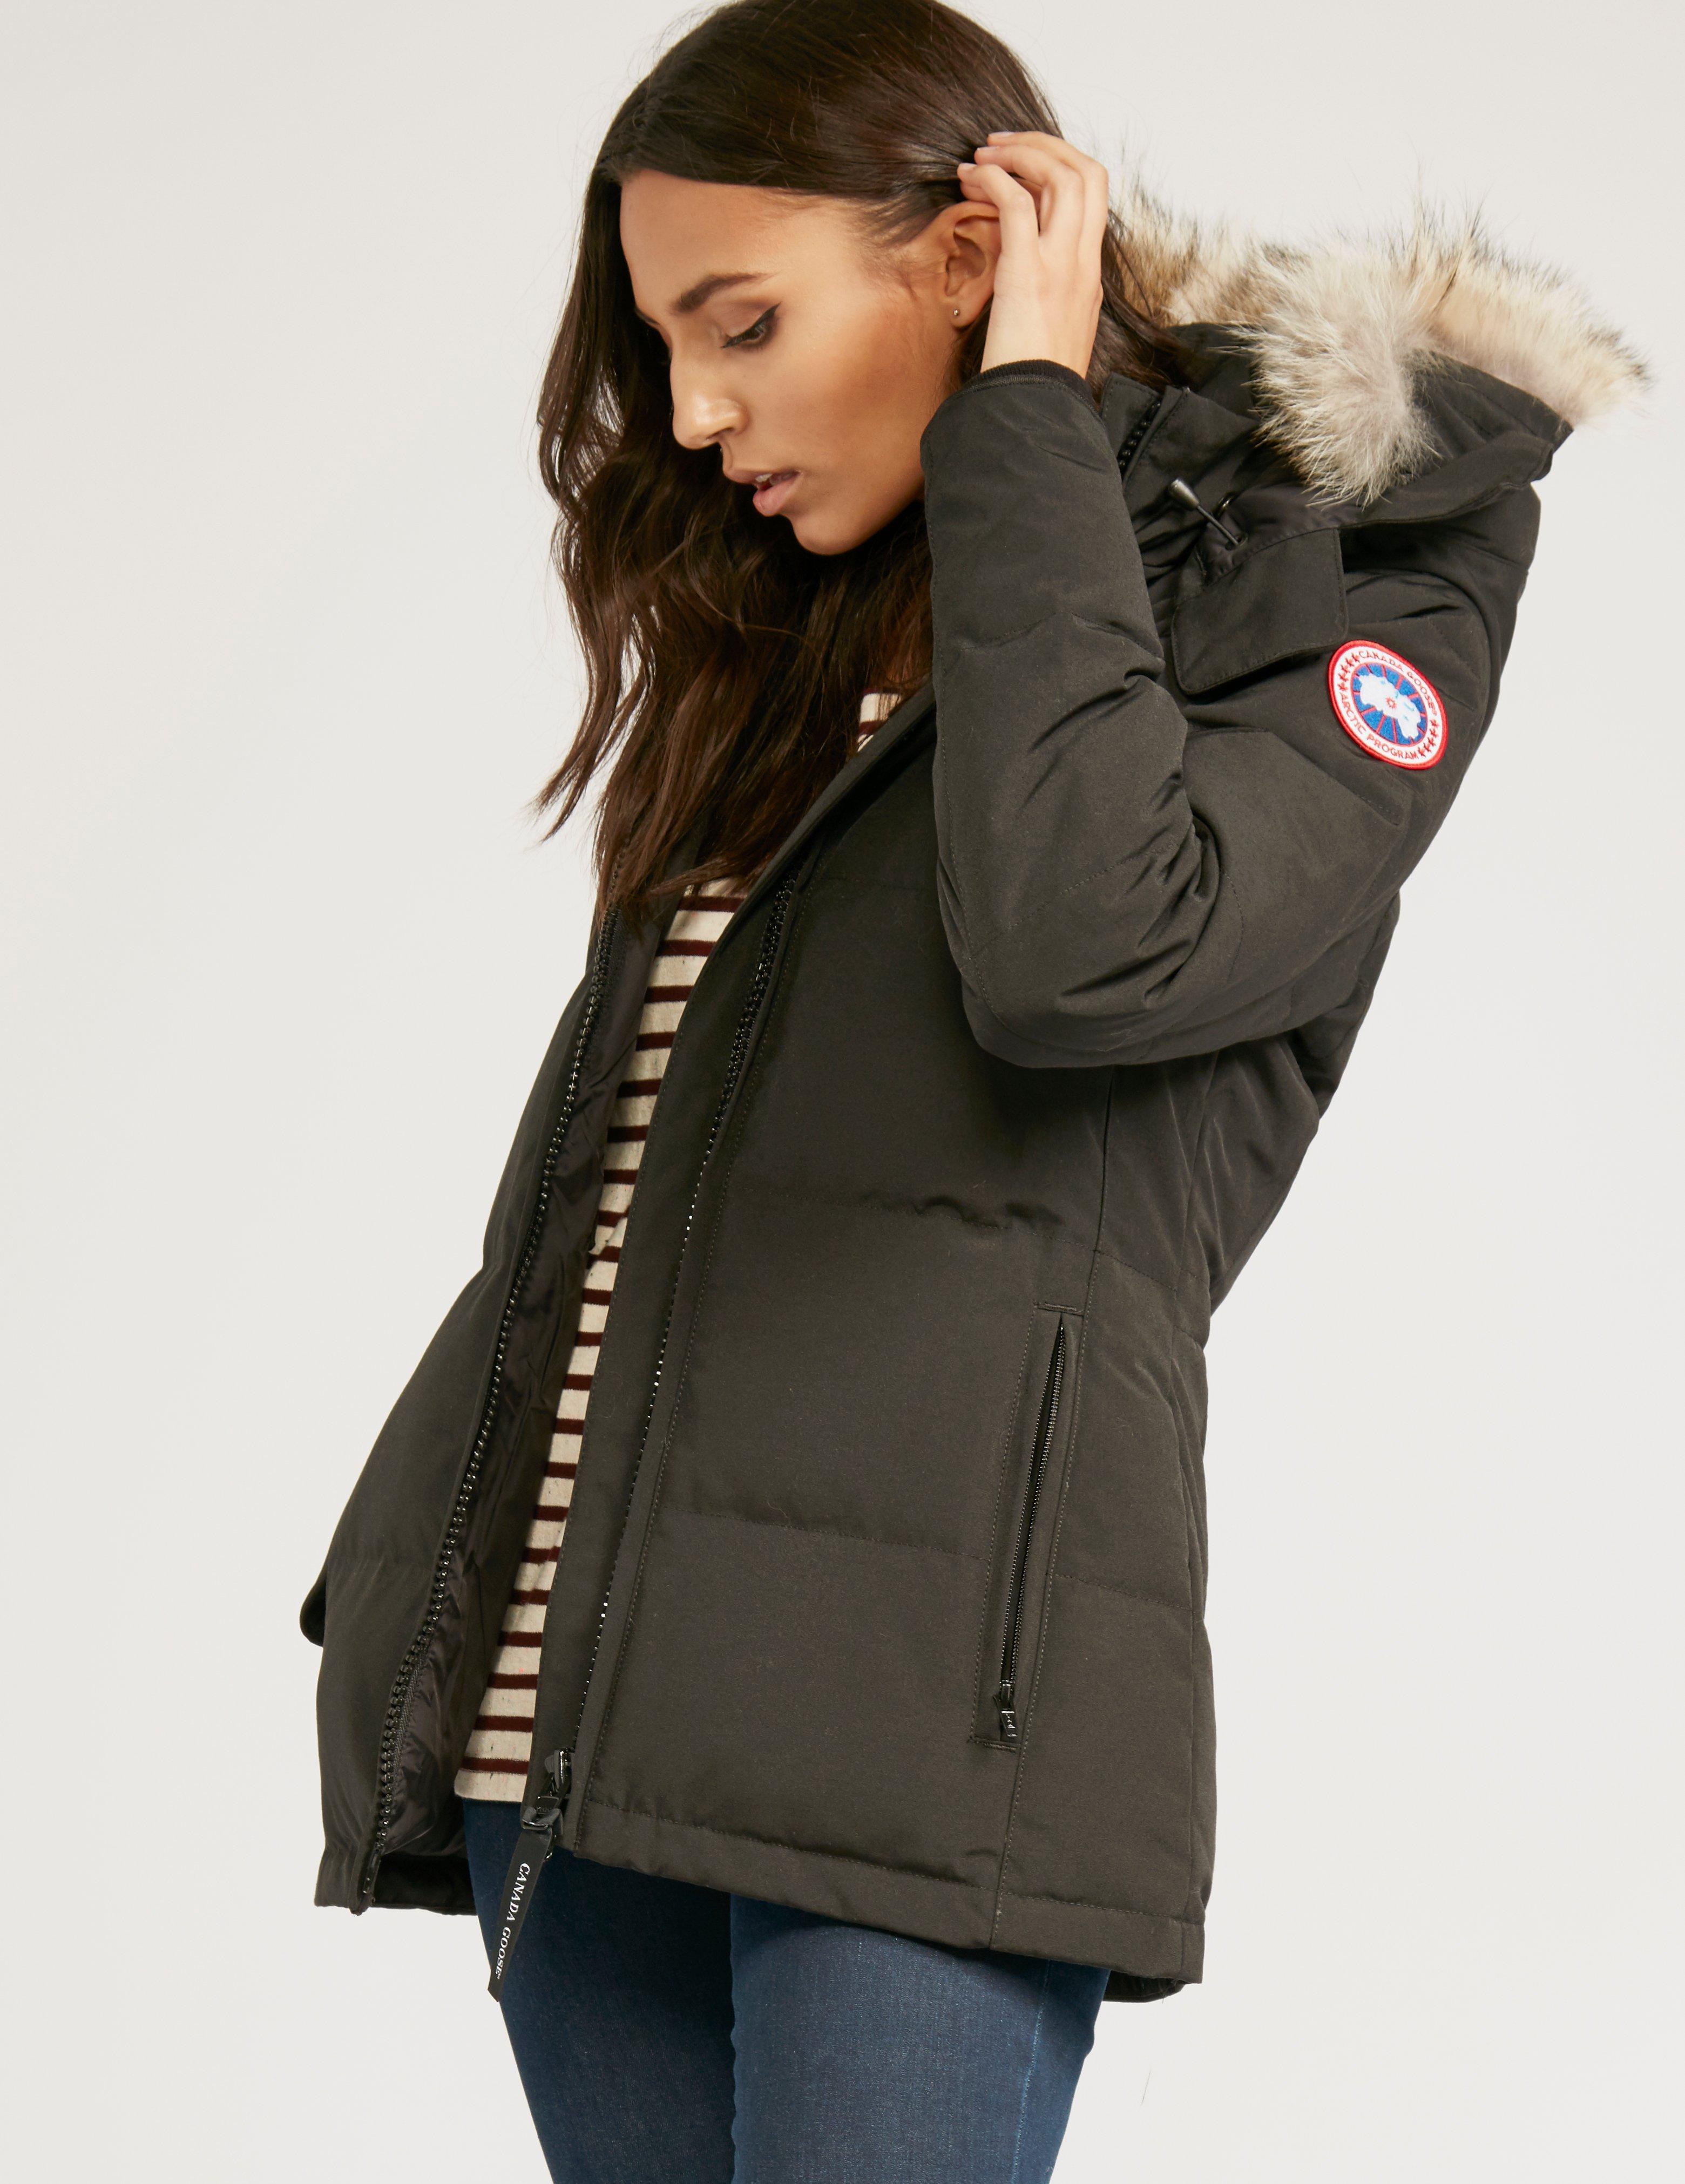 4551f941823a Canada Goose Womens Chelsea Parka Jacket Black in Black - Lyst